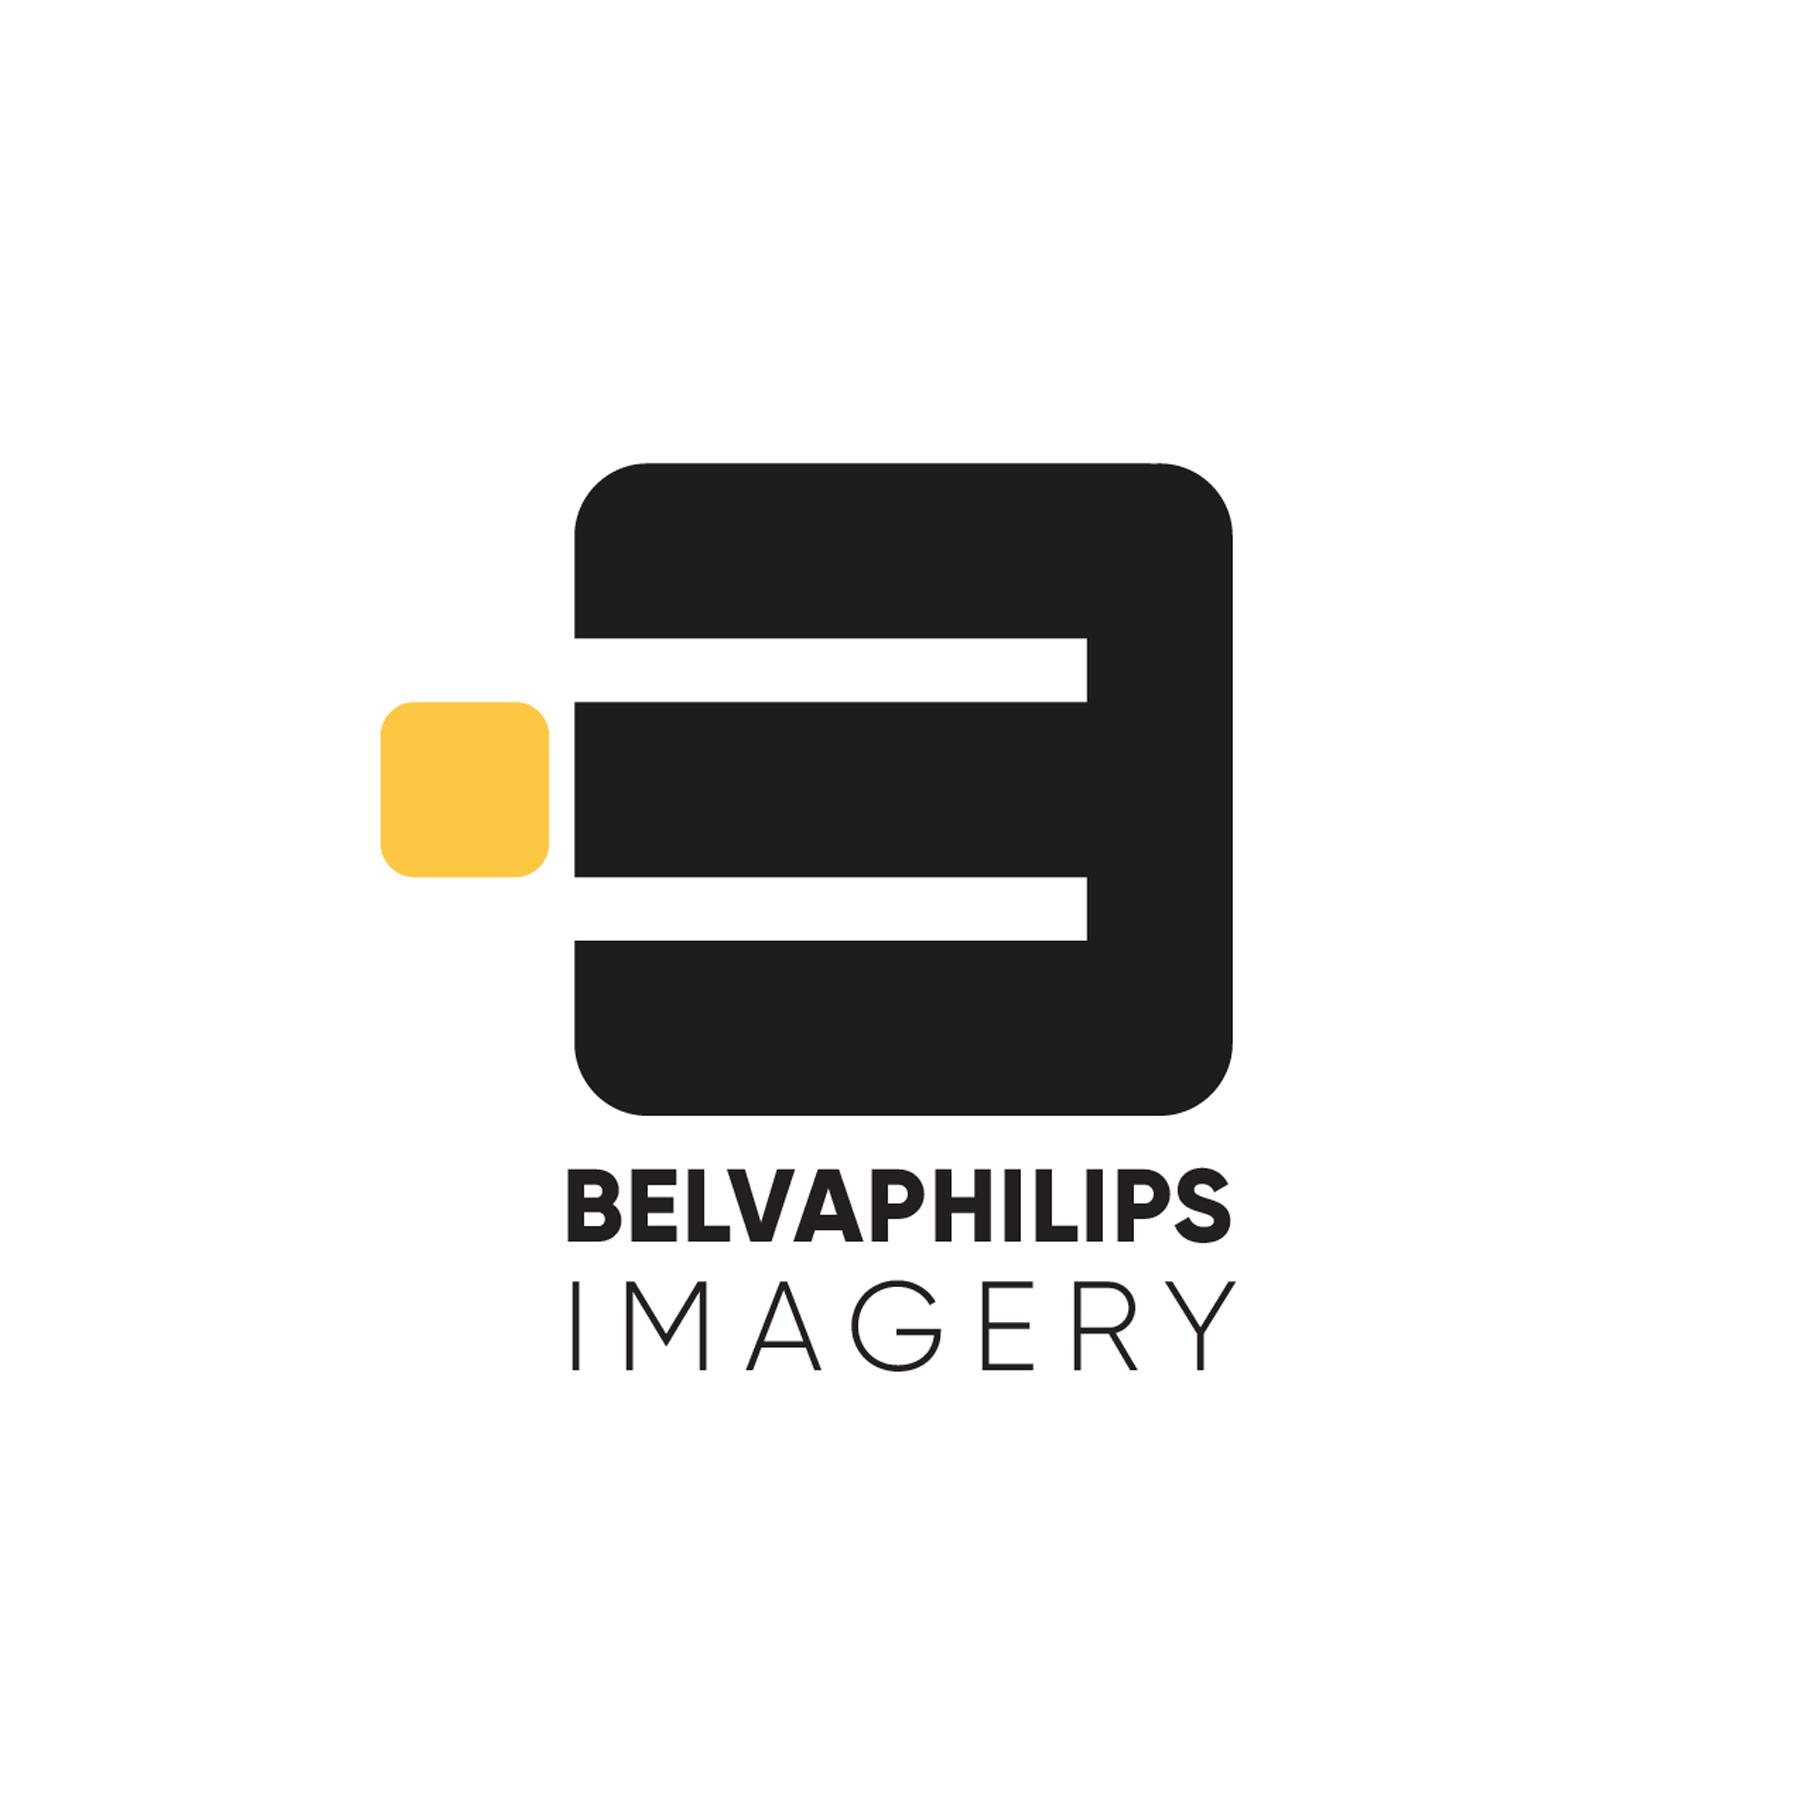 Belvaphilips.imagery logo